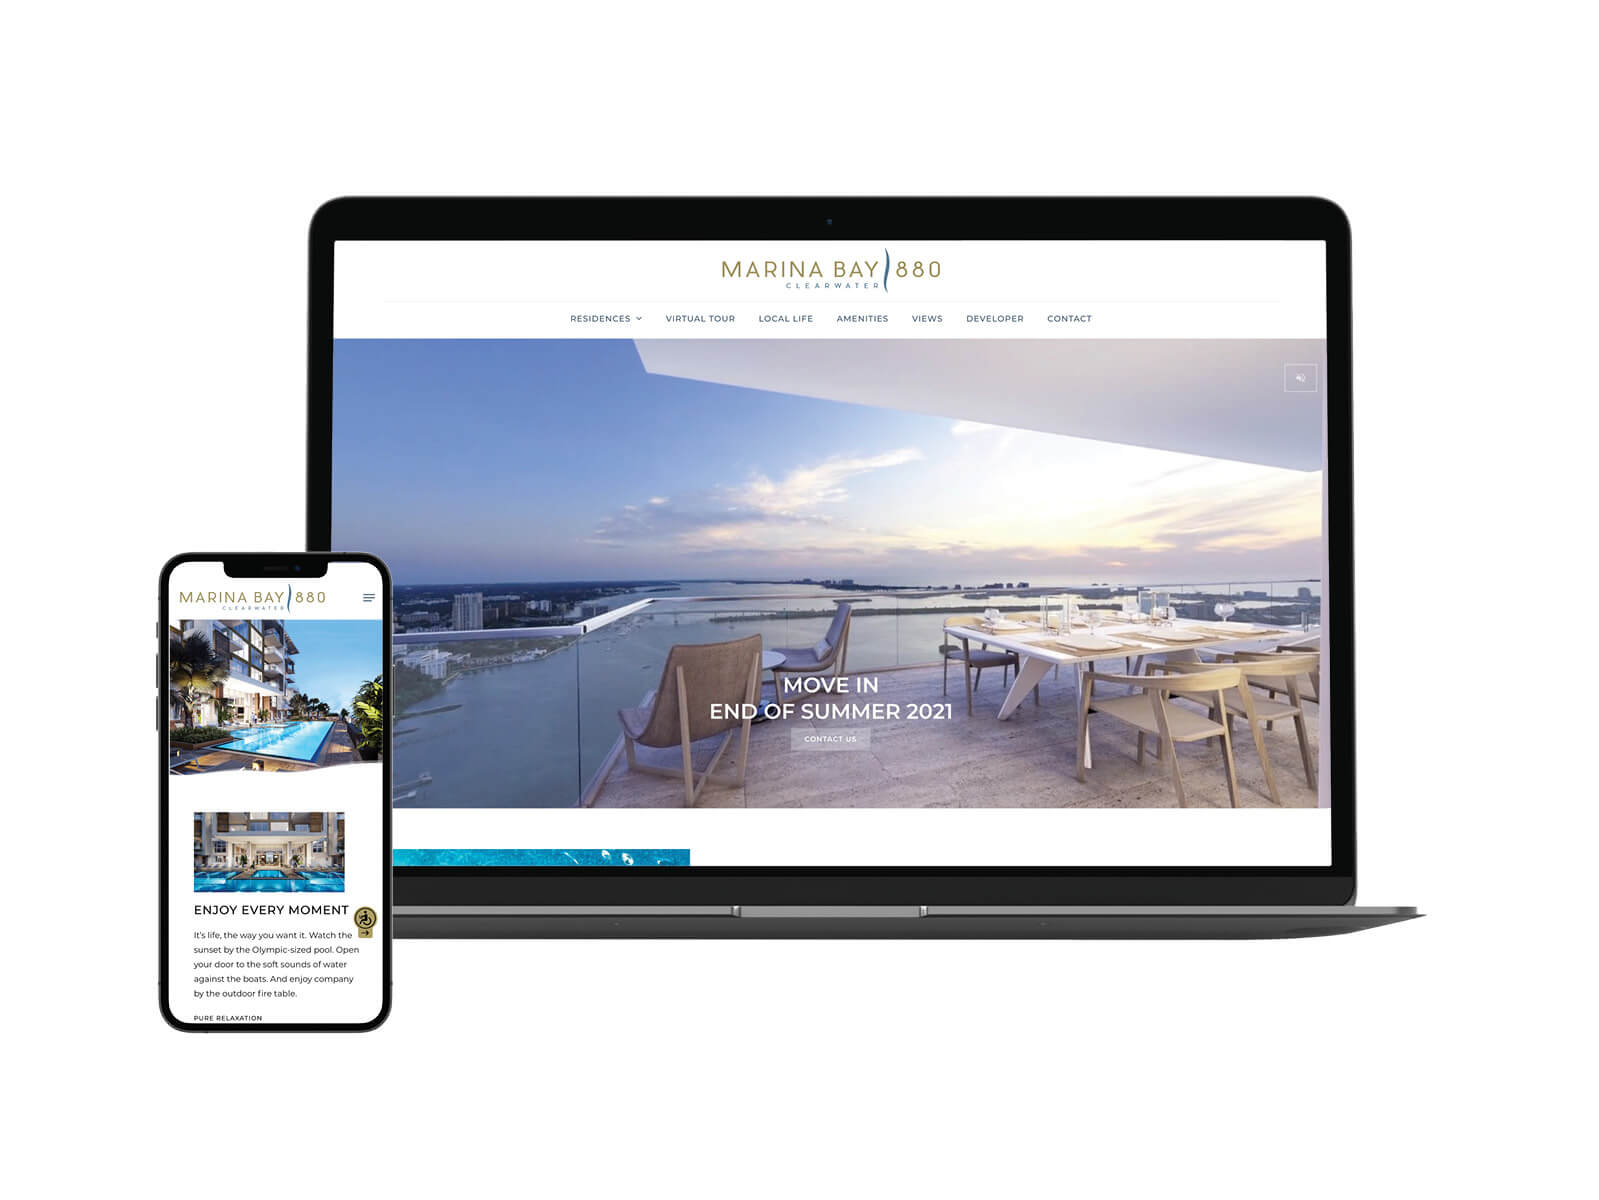 Web Design Agency Naples Florida